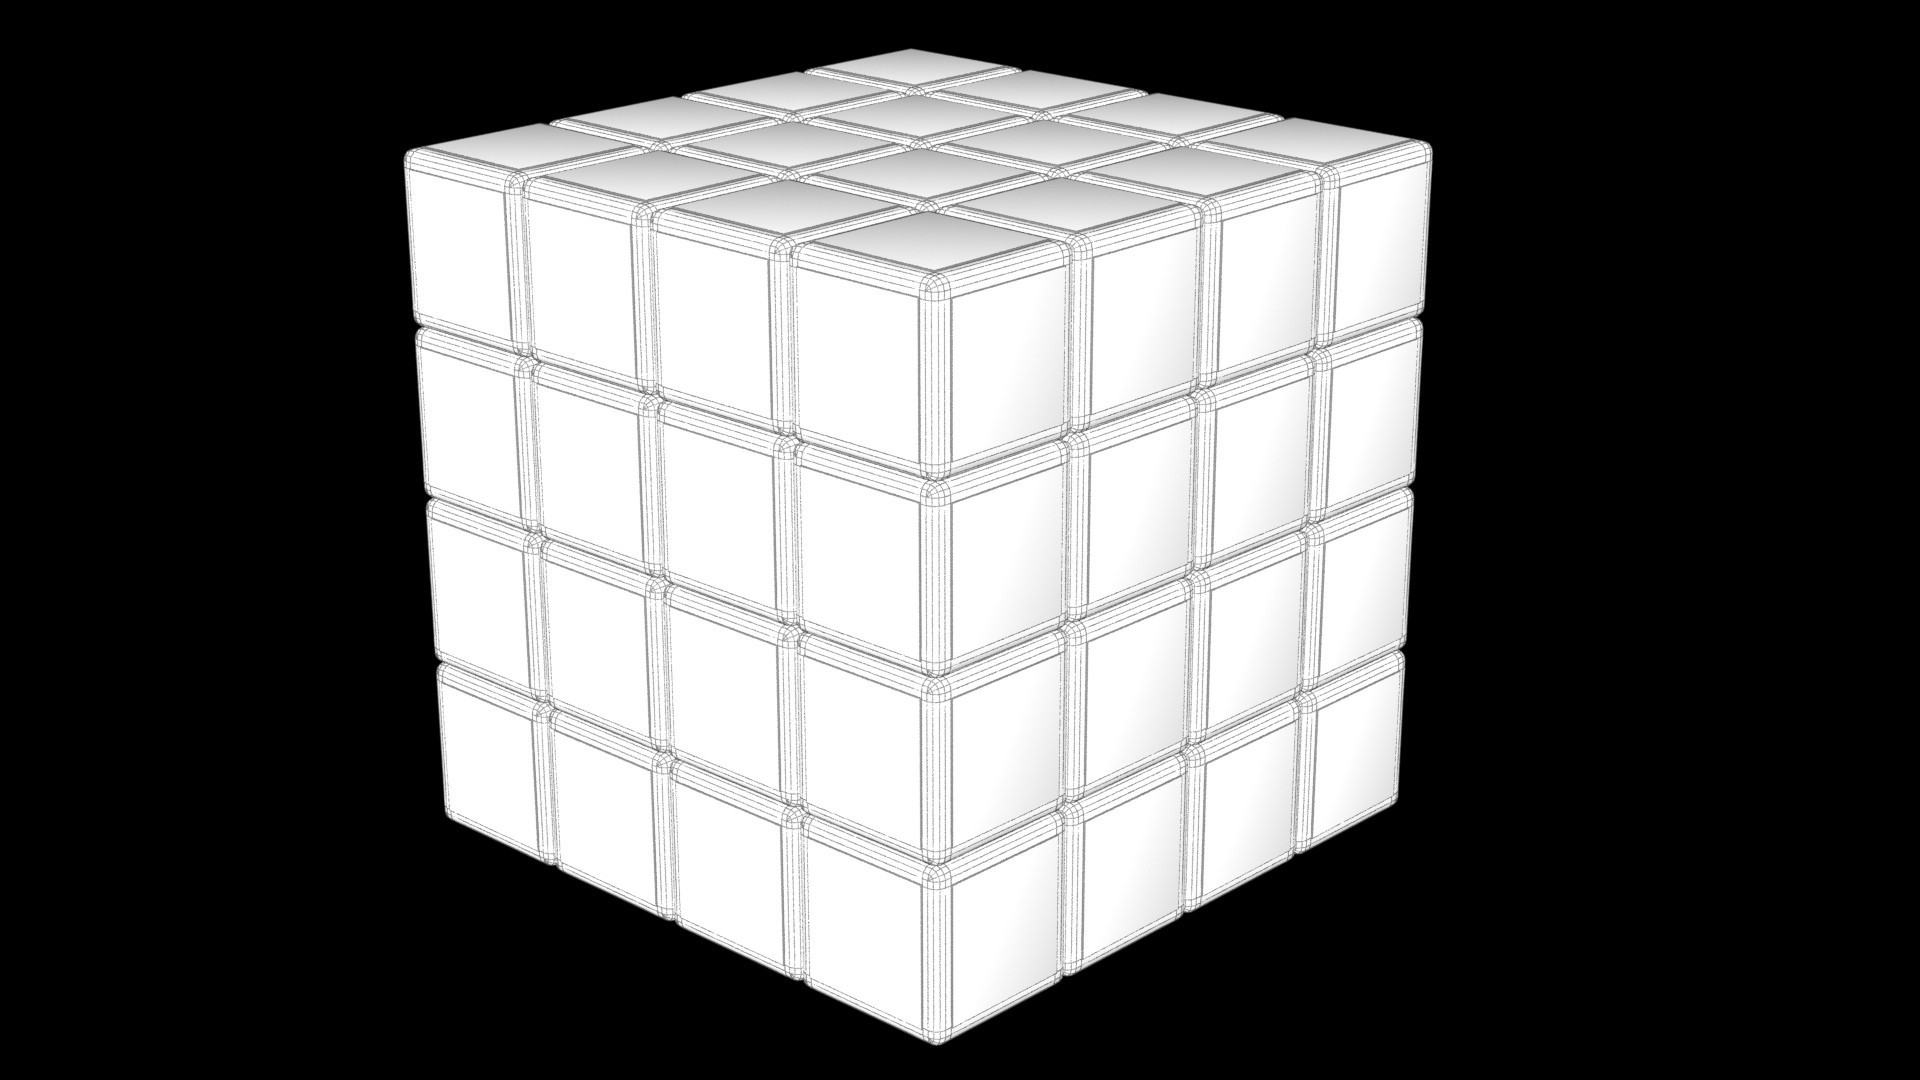 4444444k.jpg Download STL file 4X4 SCRAMBLED RUBIK'S CUBE • 3D printer template, Knight1341